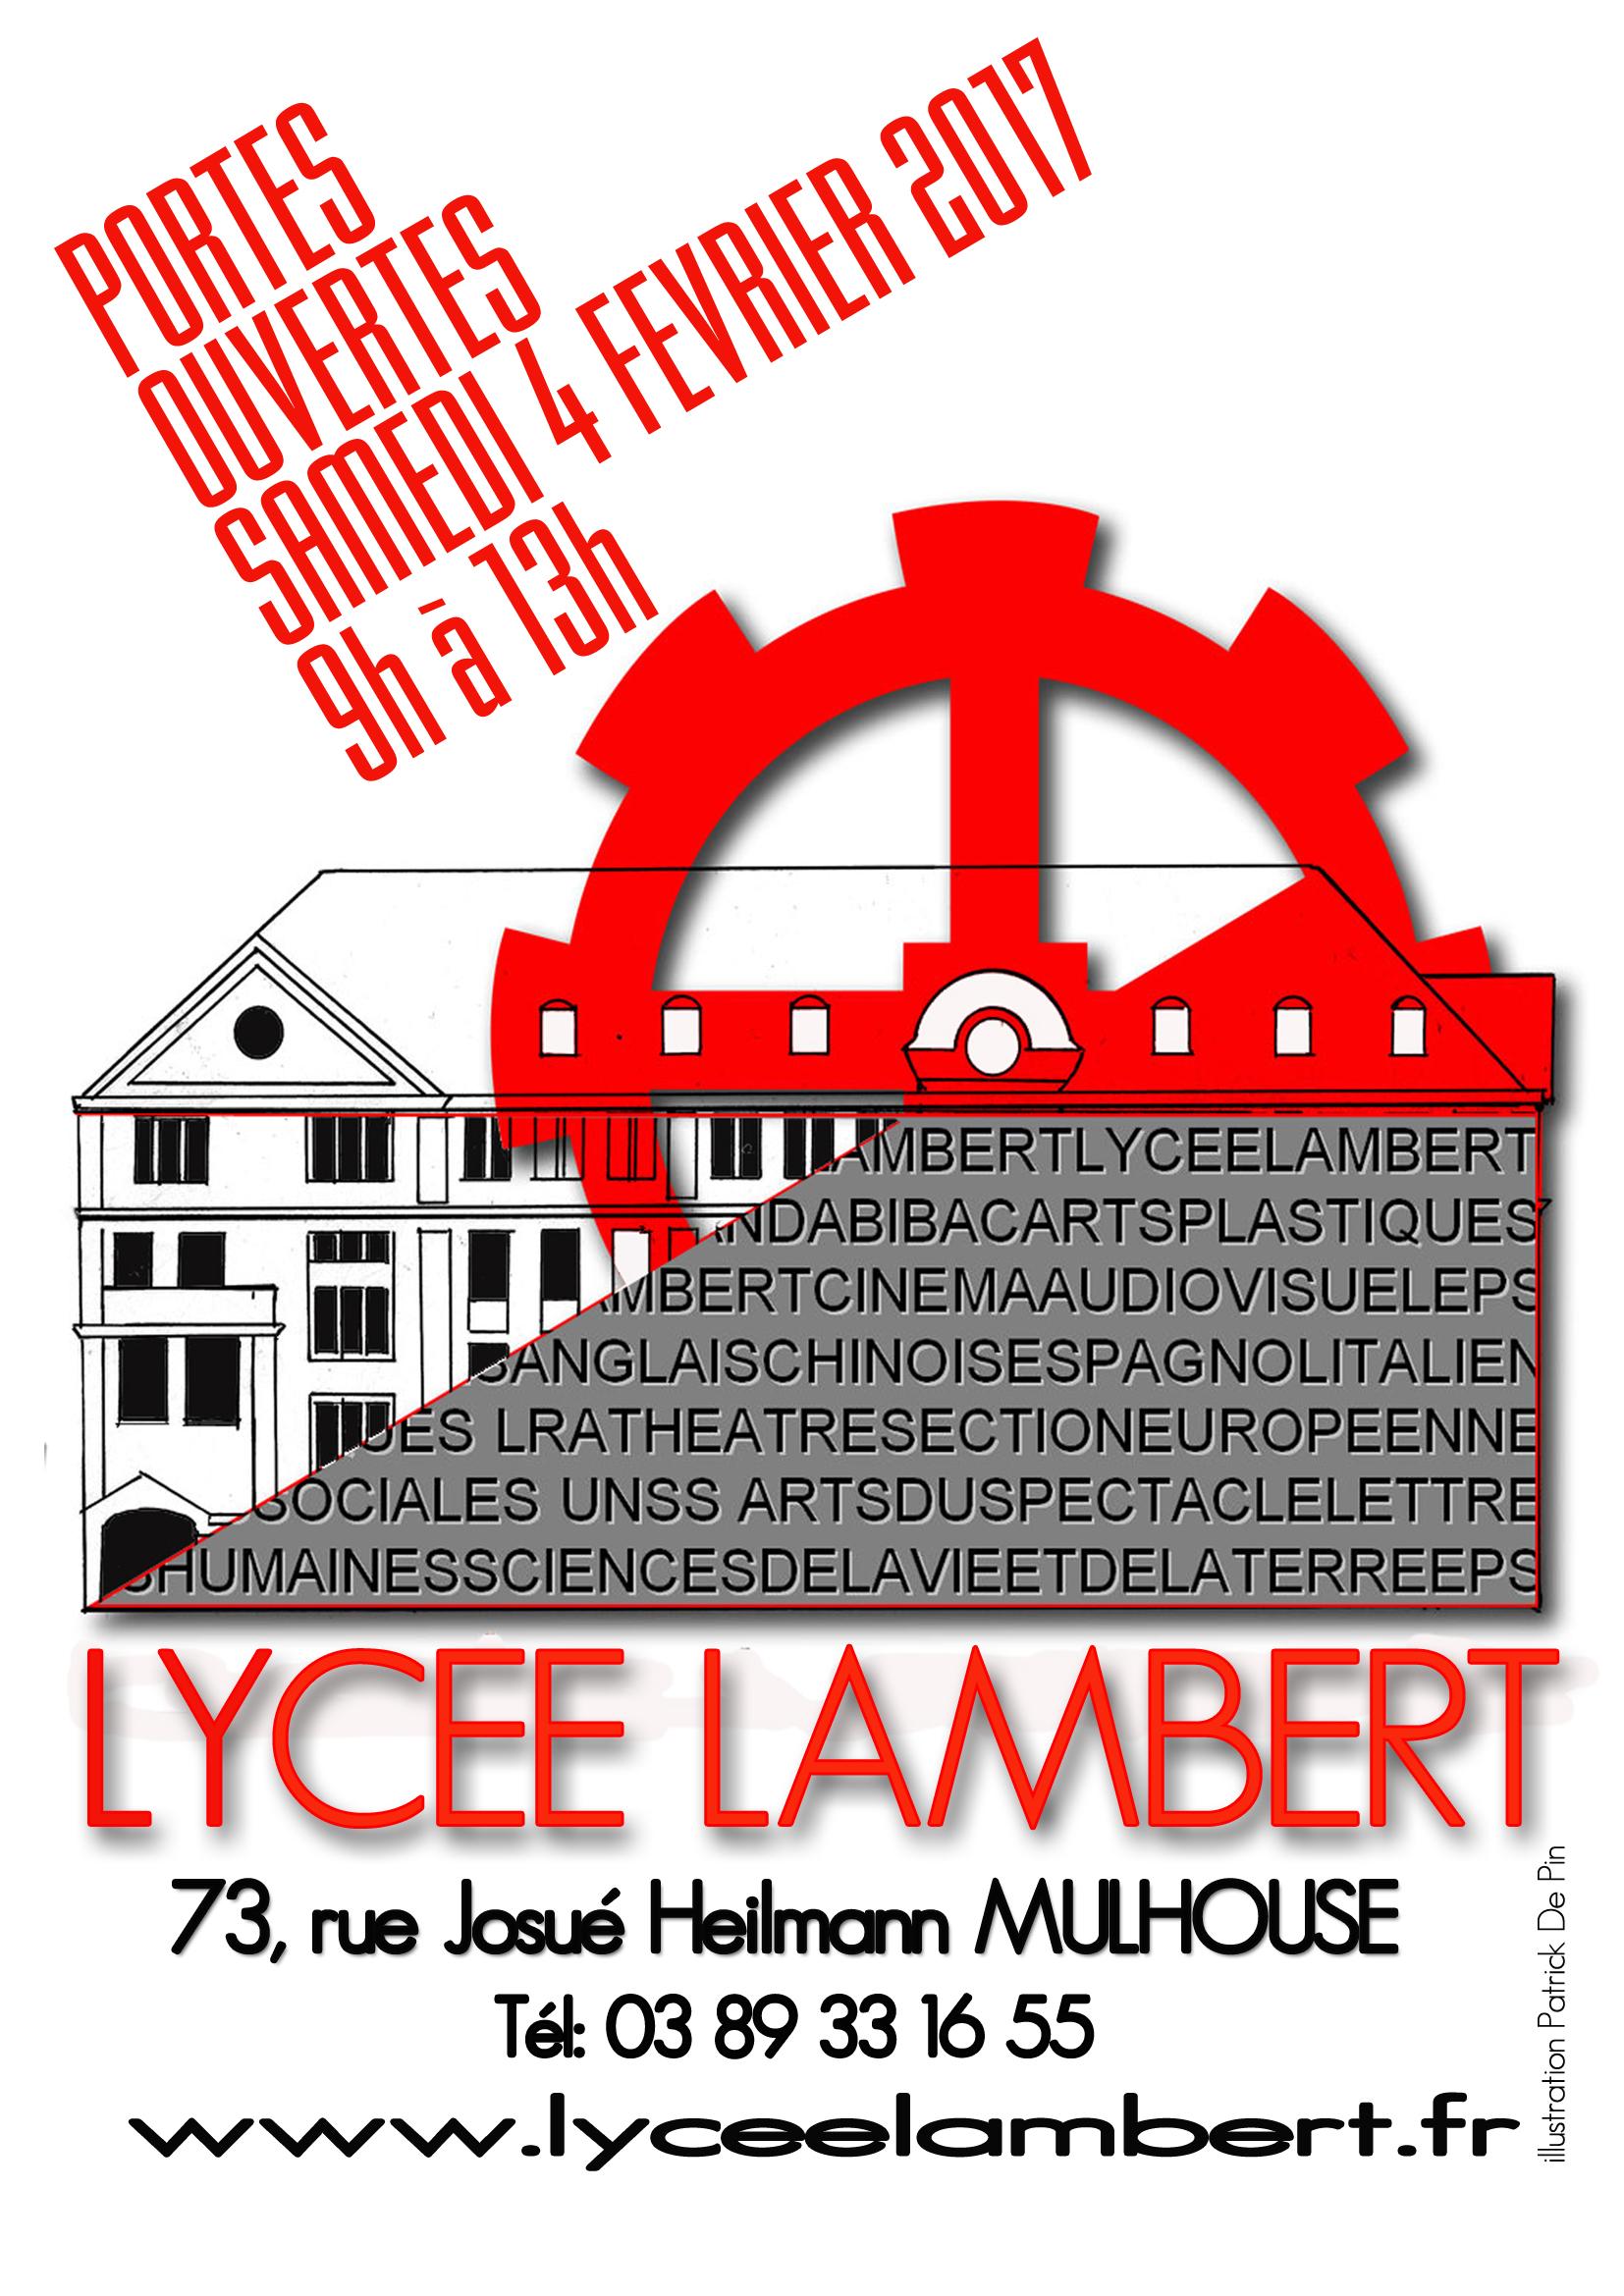 Lyce jean henri lambert 73 rue josu heilmann 68100 mulhouse - Lycee henri wallon valenciennes portes ouvertes ...